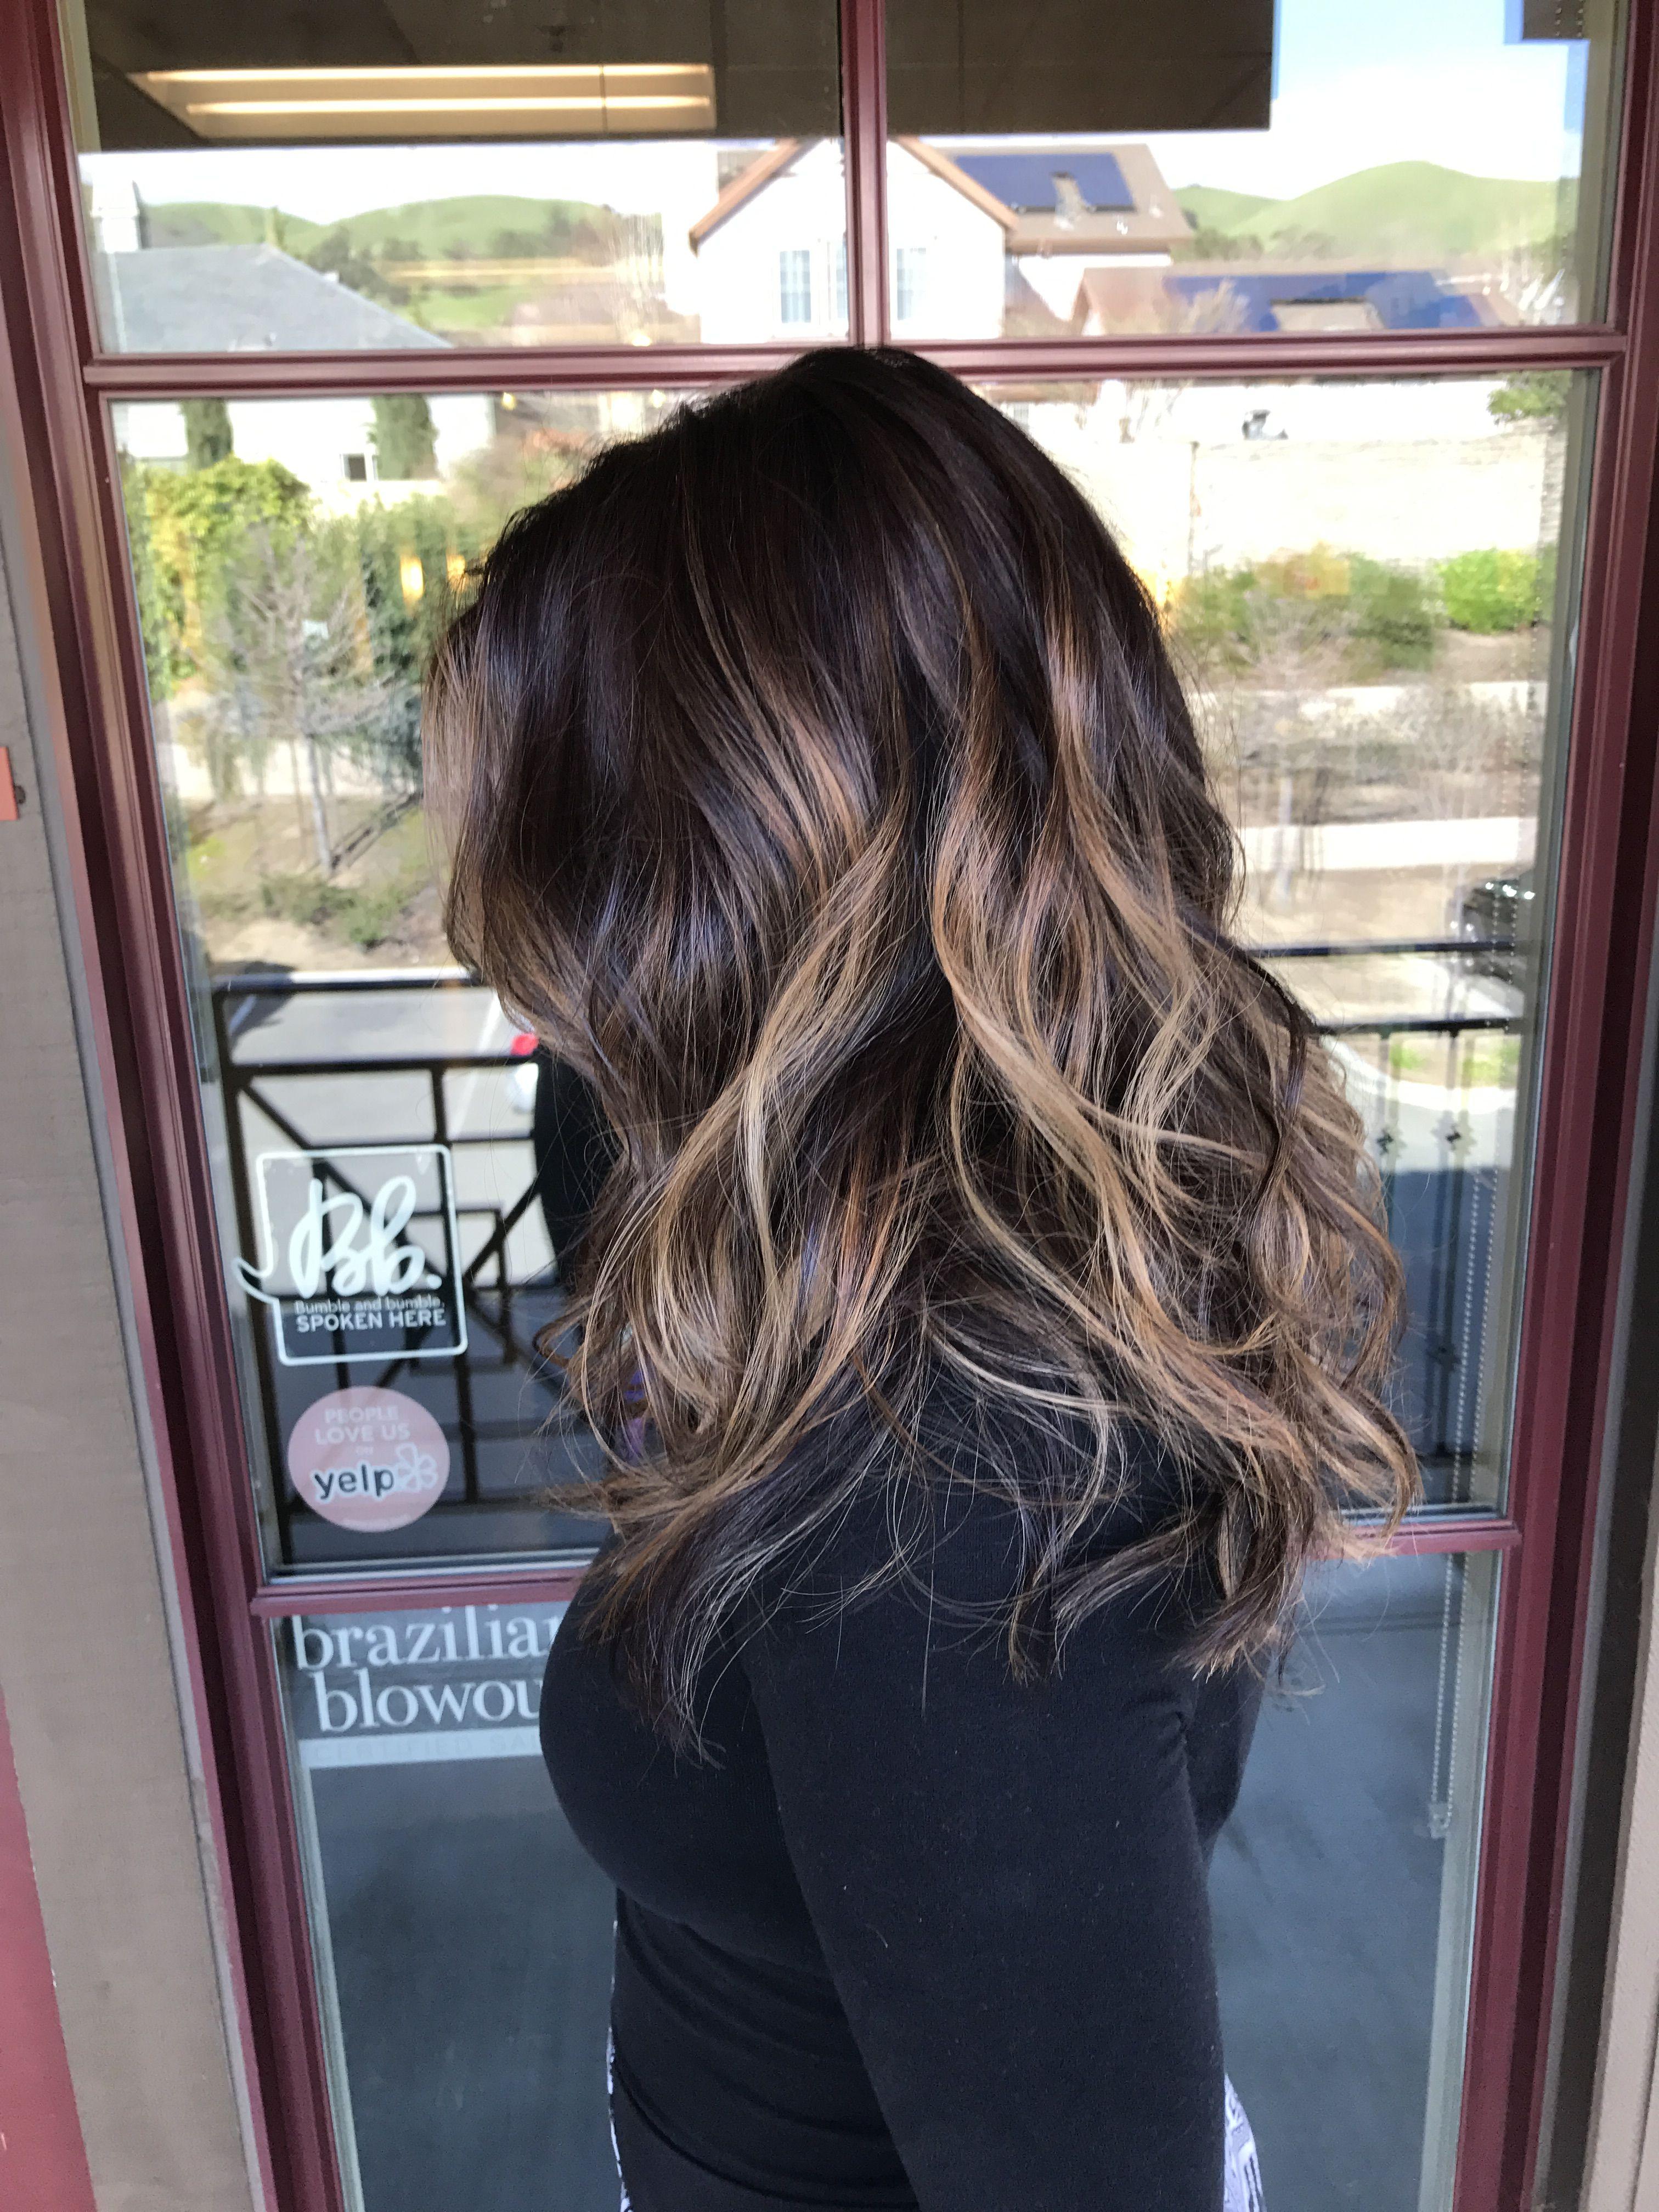 Balayage On Tanned Skin And Black Hair Black Hair Ombre Black Hair Balayage Hair Color For Tan Skin